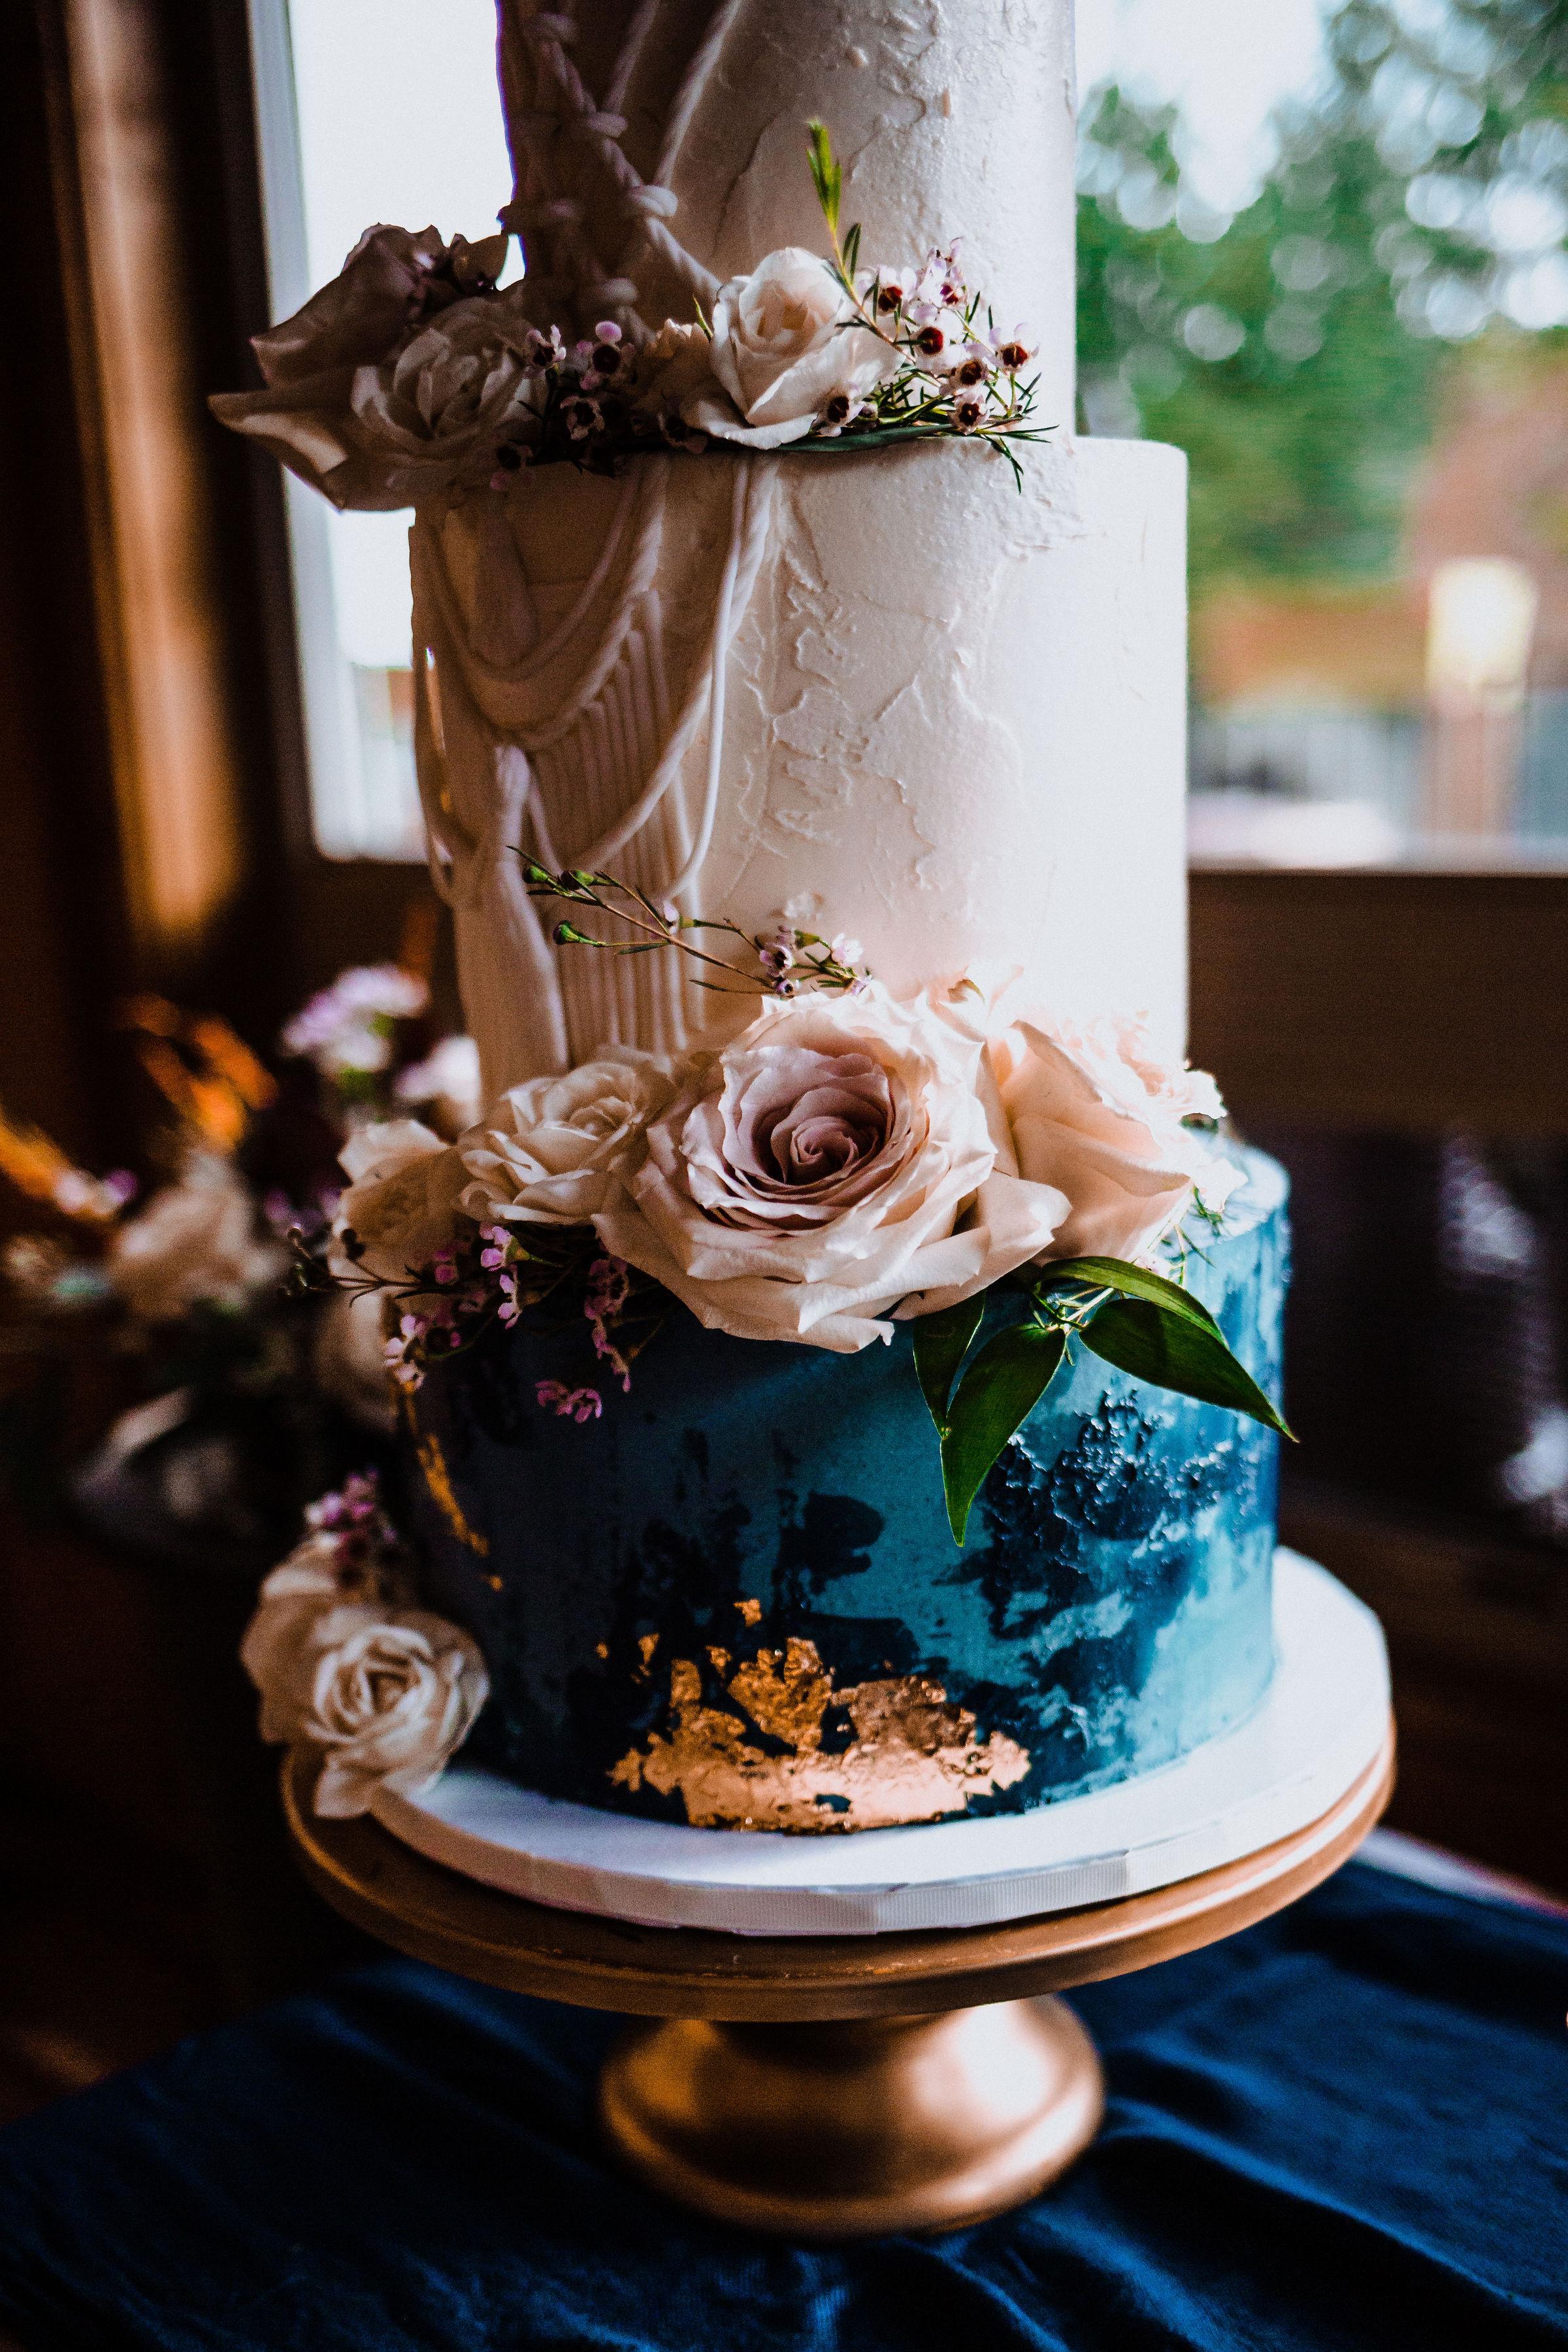 GoldenElopement- Elegant Cake